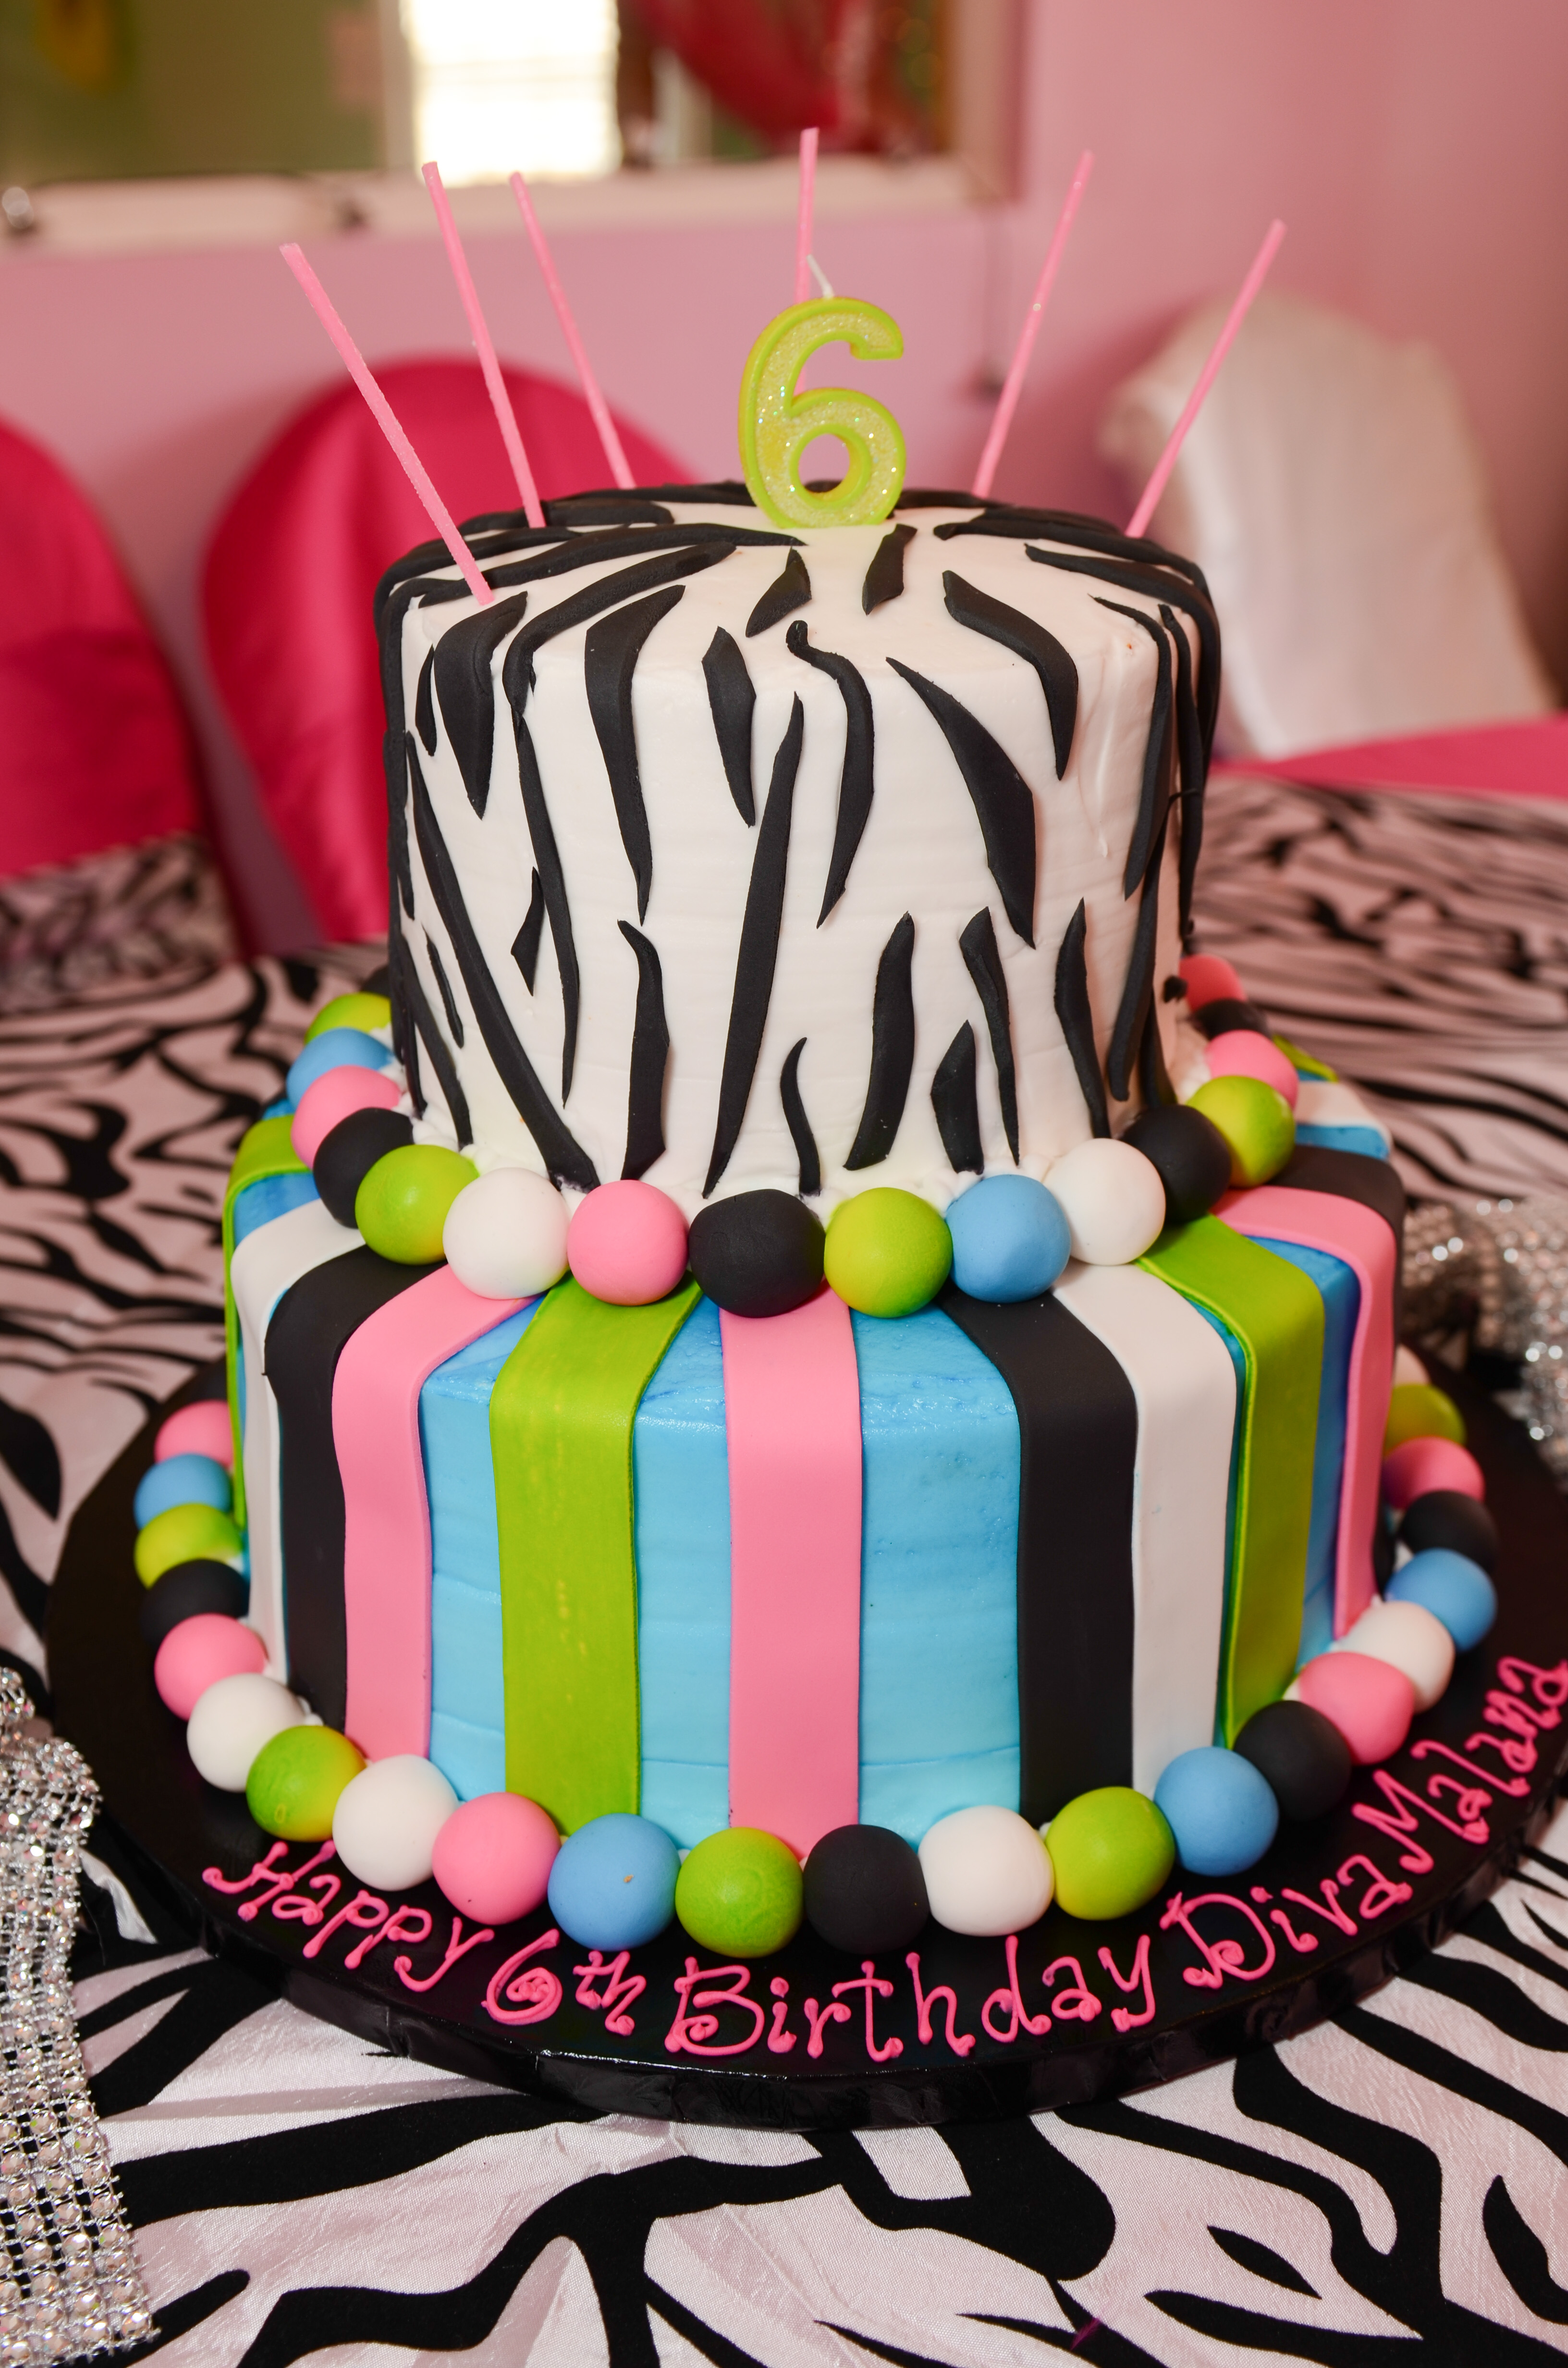 Customized birthday cakes